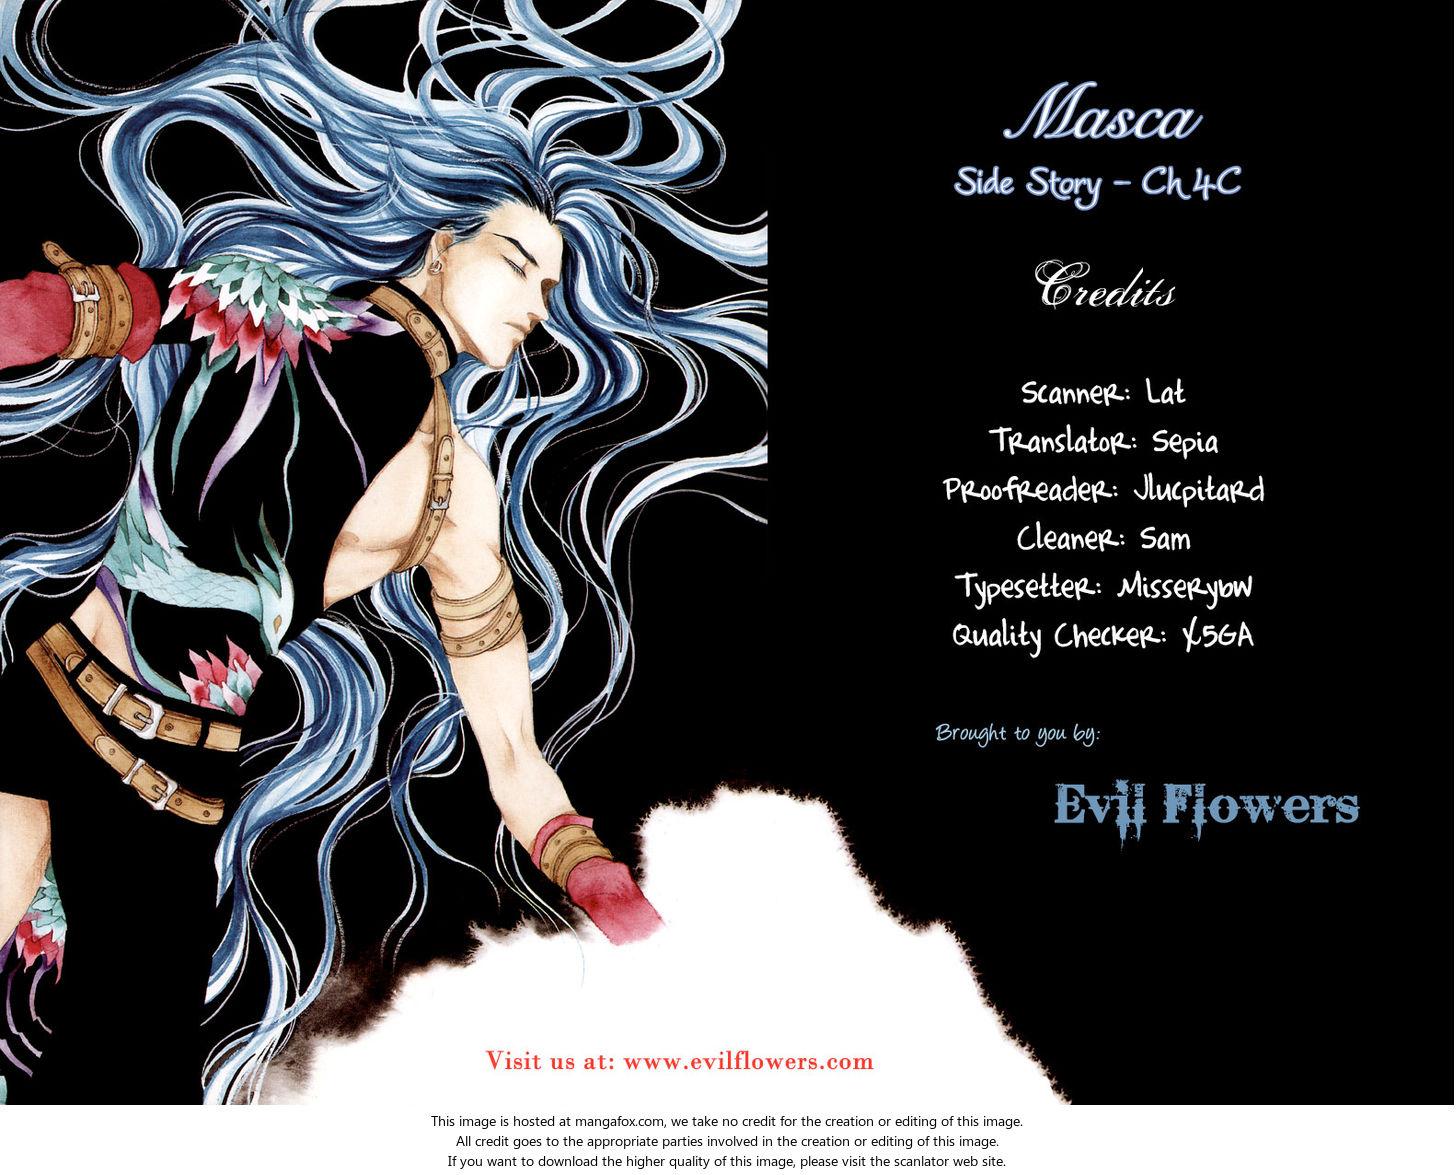 Masca: The Beginning 4.3 at MangaFox.la